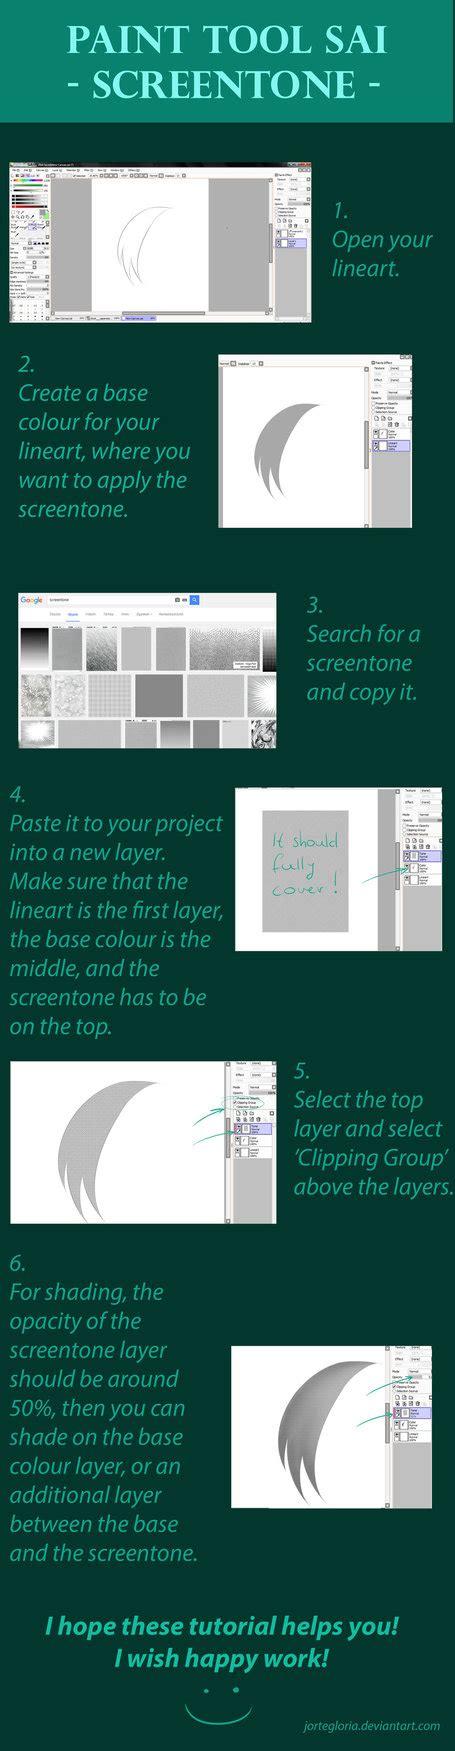 paint tool sai screentone paint tool sai screentone tutorial by jortegloria on